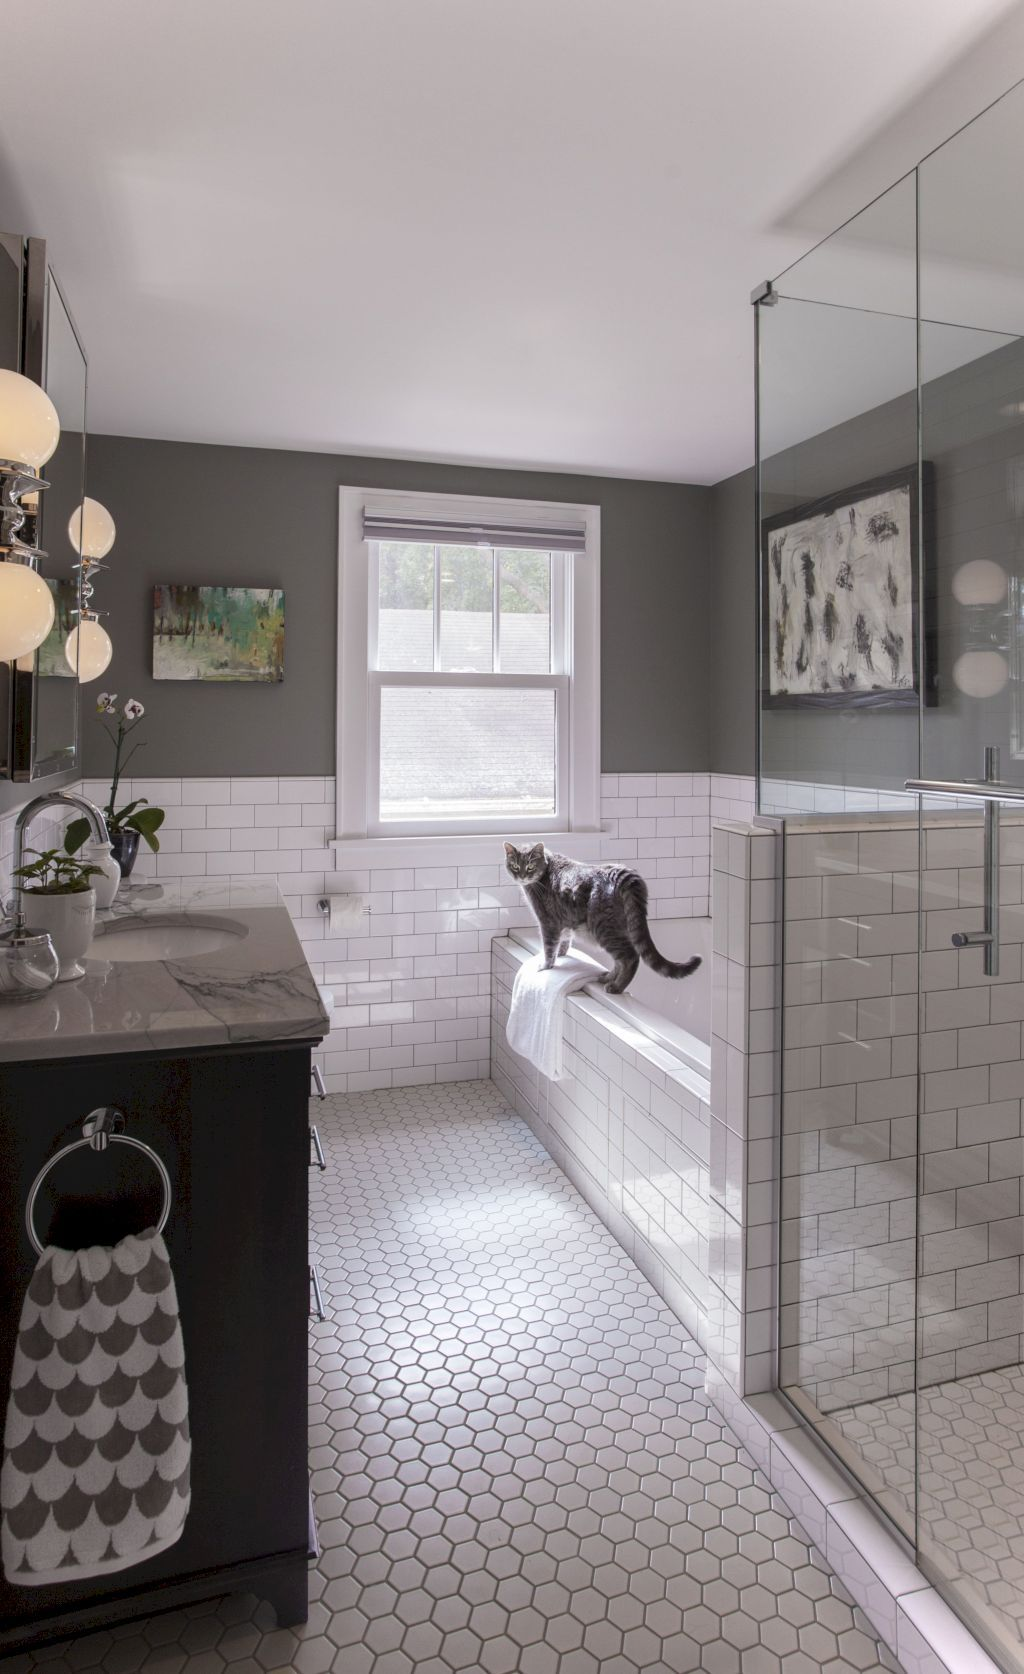 80 Stunning Farmhouse Bathroom Tiles Ideas Bathrooms Remodel Bathroom Makeover Small Bathroom